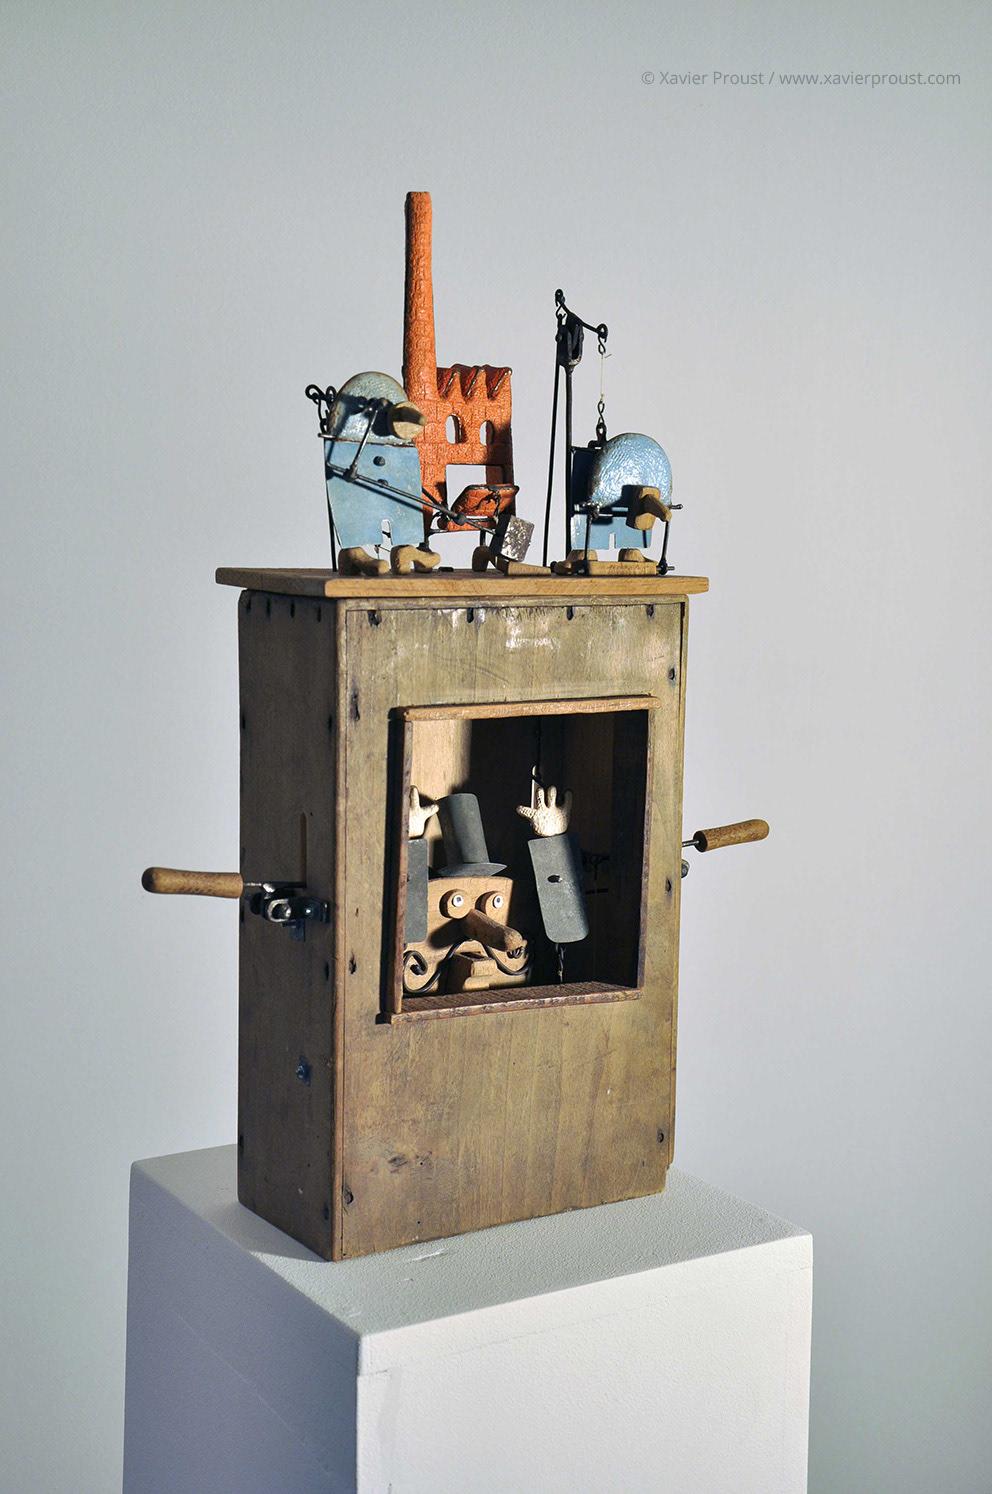 xavier proust sculptor sculpture kinetic automata